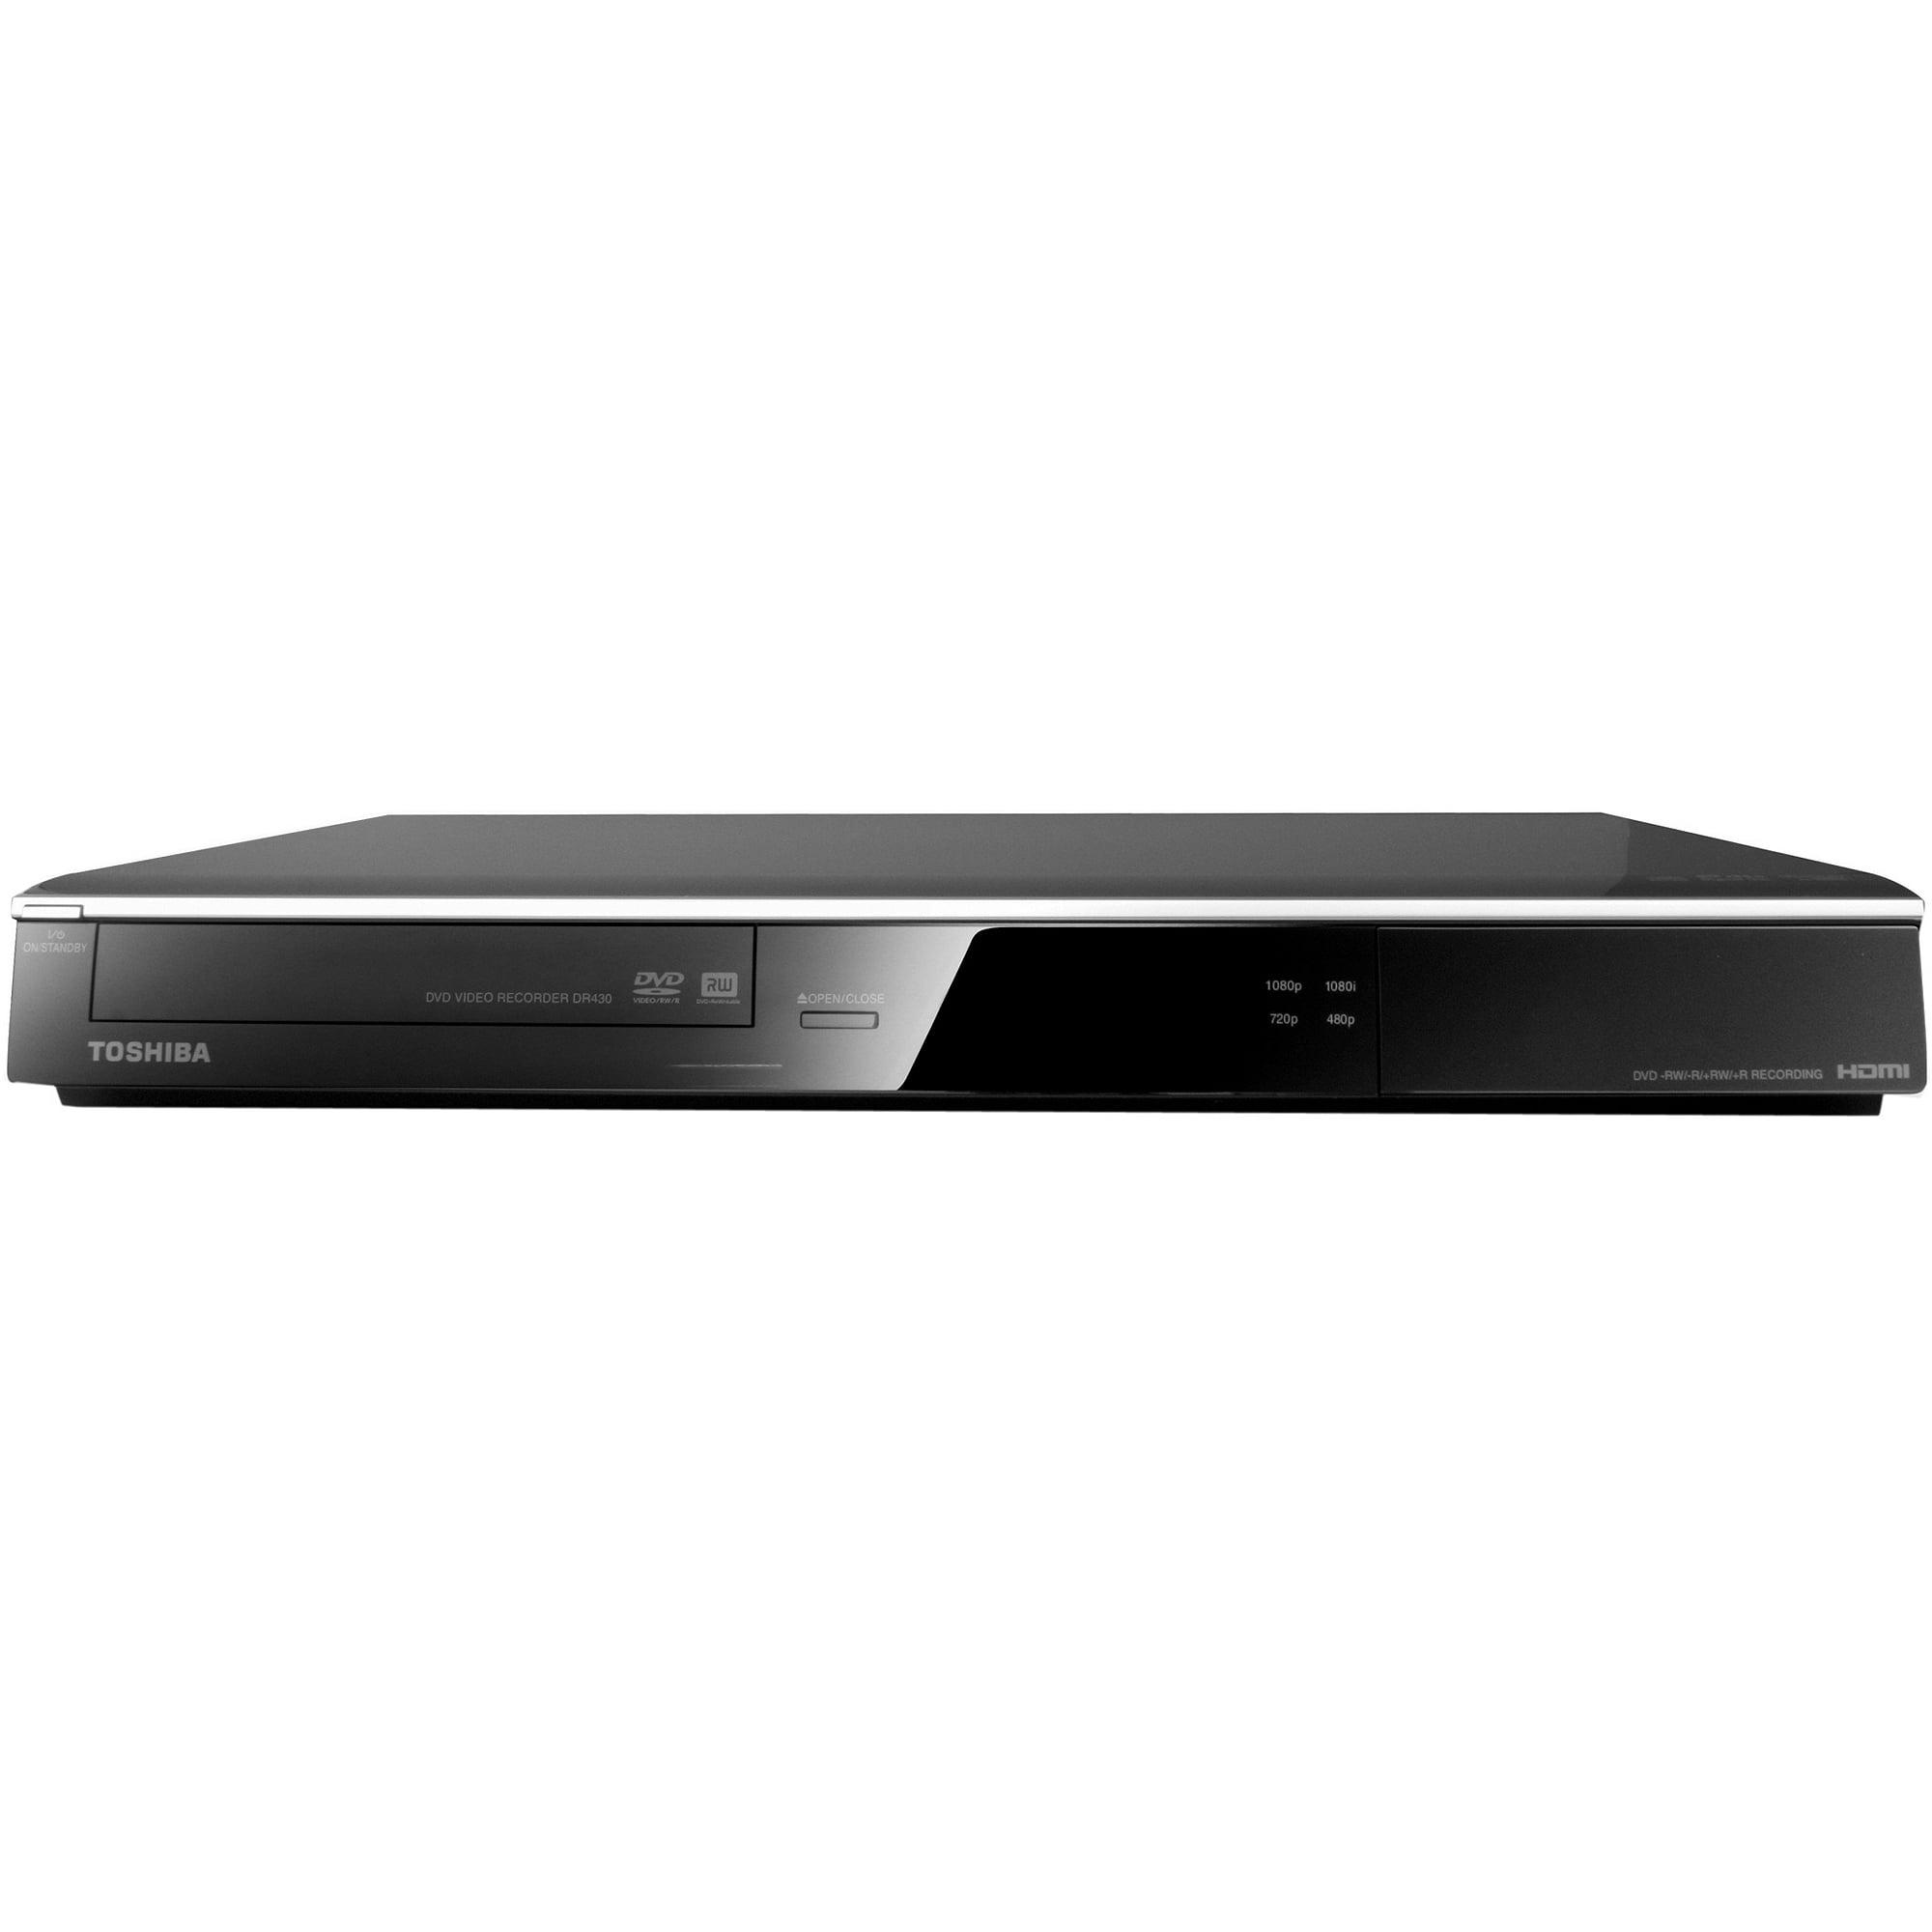 toshiba dvd recorder hdmi 1080p one walmart com rh walmart com toshiba dr430 dvd recorder user manual Toshiba DR430 DVD Recorder 1080P